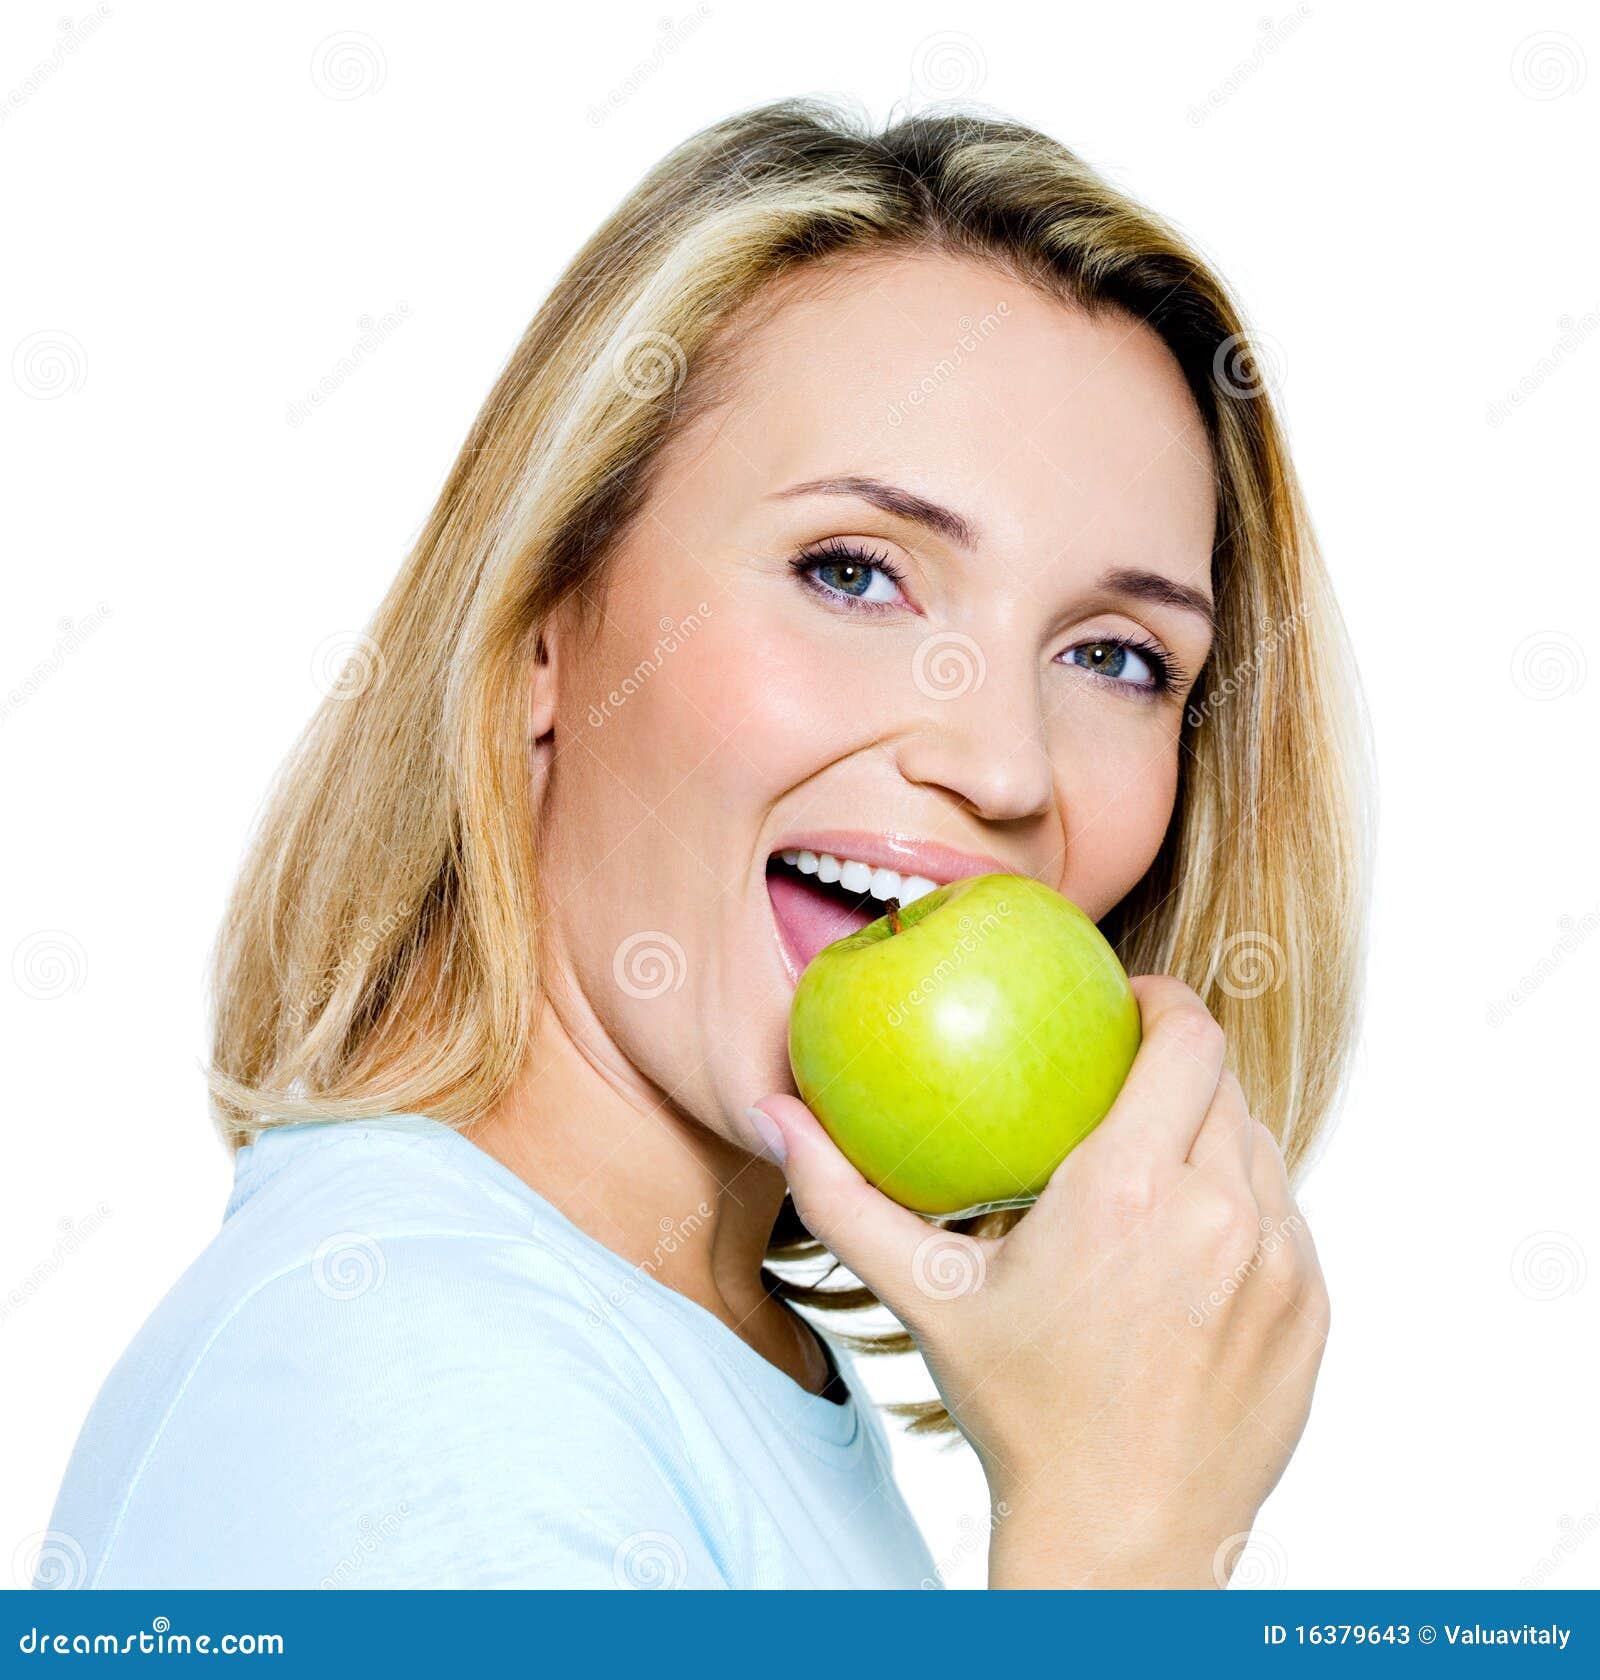 Fotos de Manzana roja de stock, imágenes de Manzana